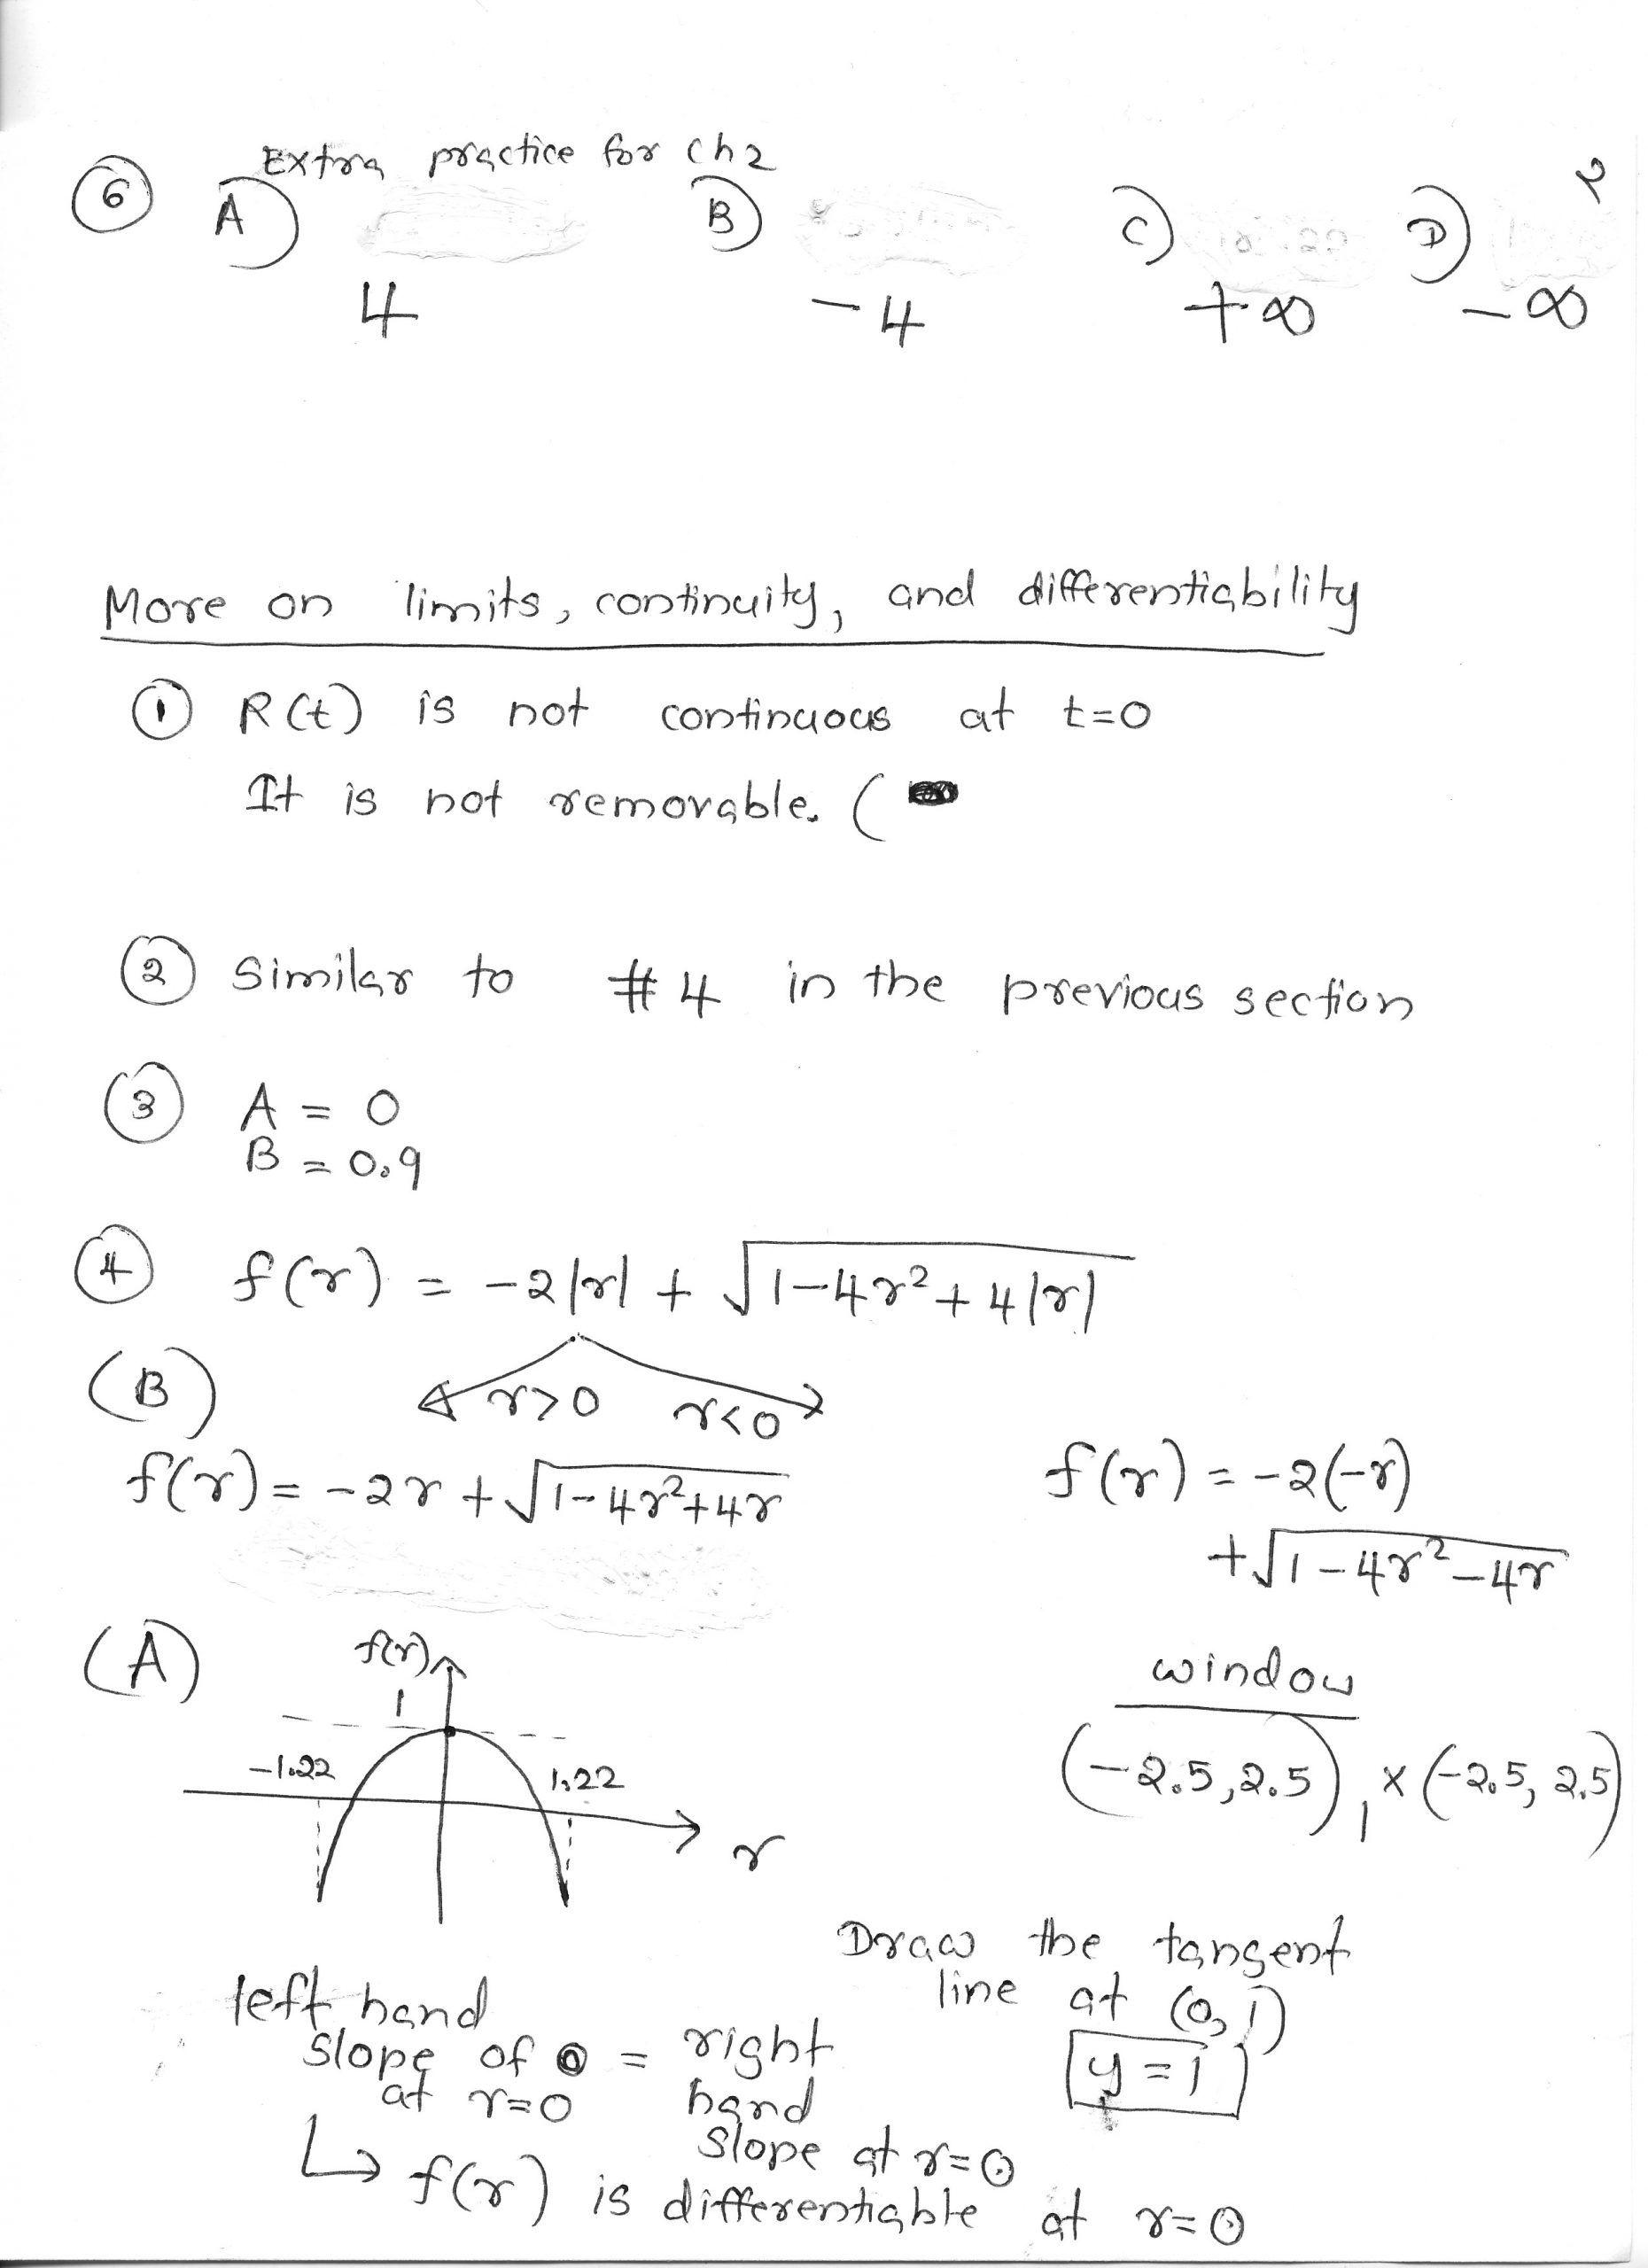 24 College Math Worksheets In 2021 Algebra Worksheets Math Worksheets Writing Worksheets Kindergarten